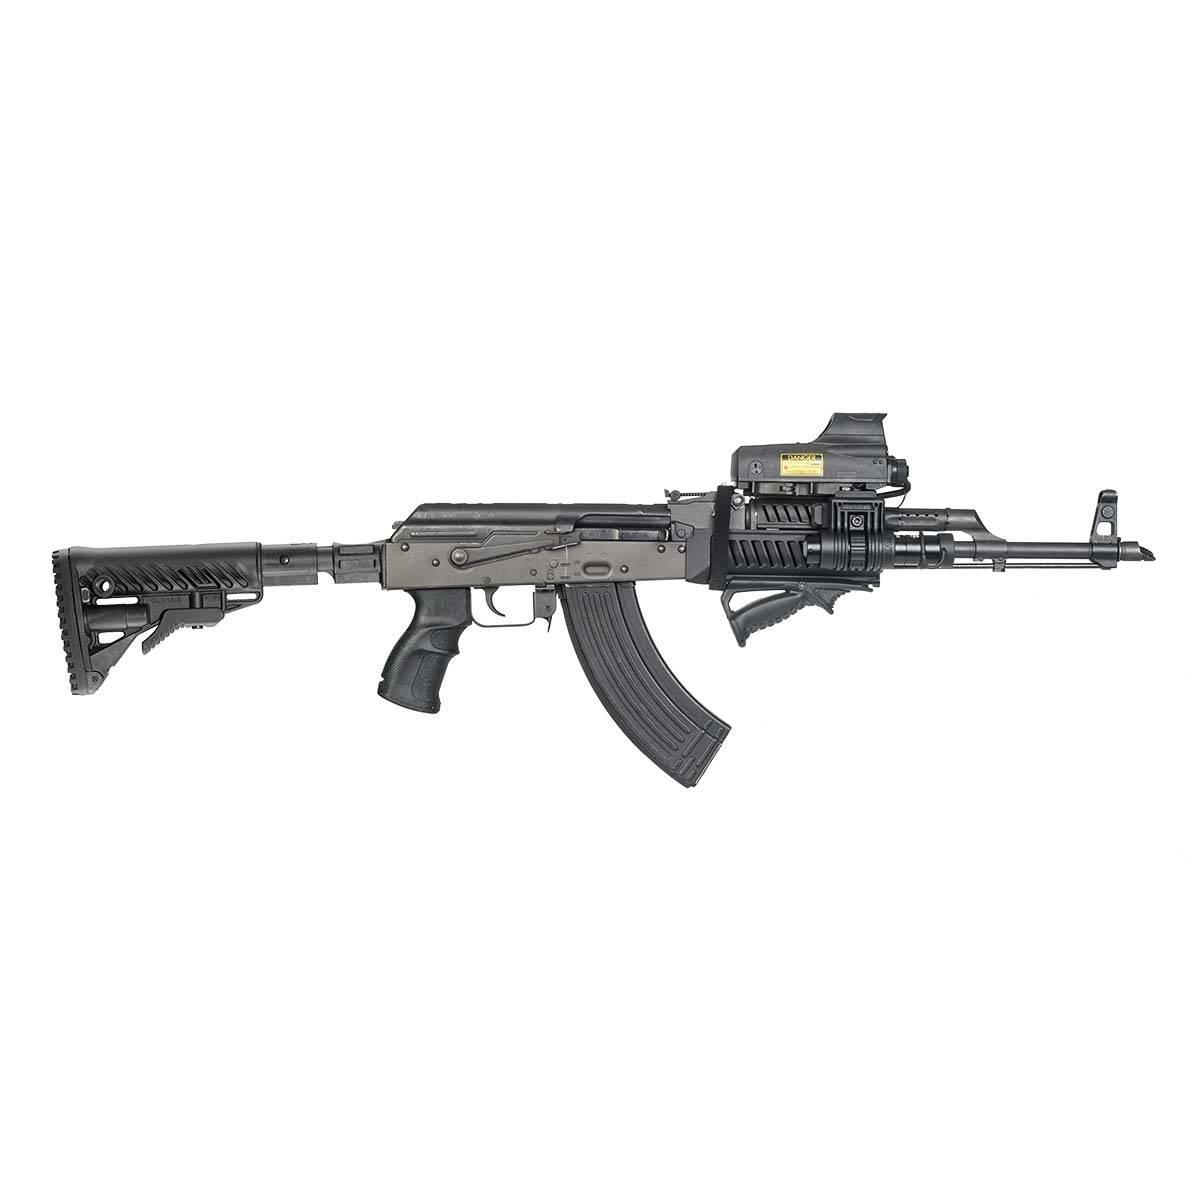 fab-defense-shock-absorbing-ak-47-buffer-tube-4